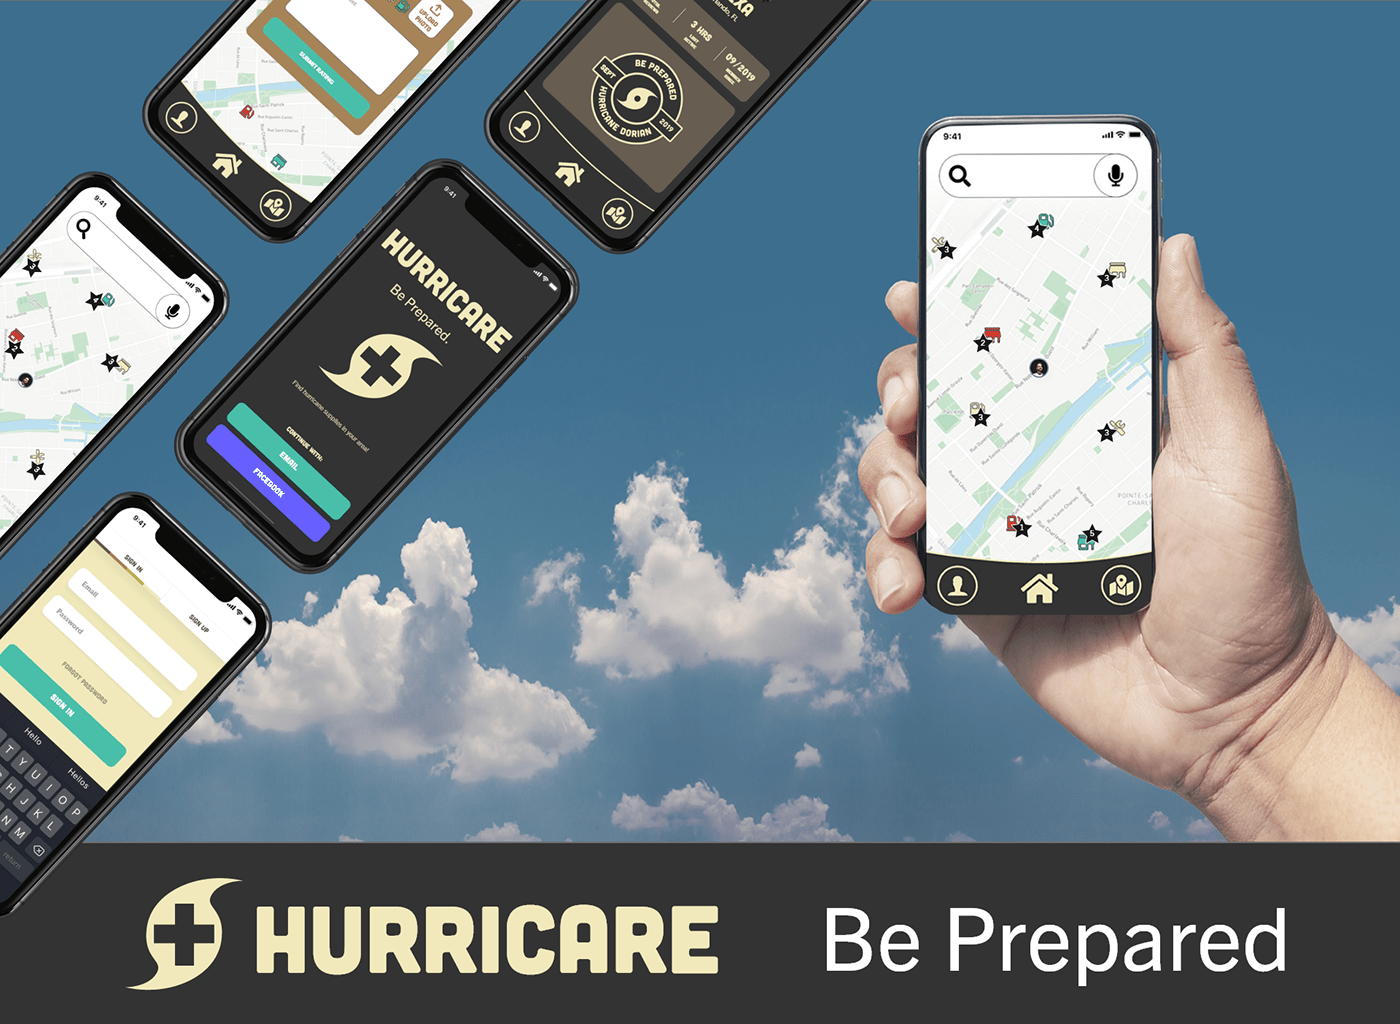 adobelive adobeawards xD ucf Clites hurricane app hurricare live CaseStudy Adobe Portfolio